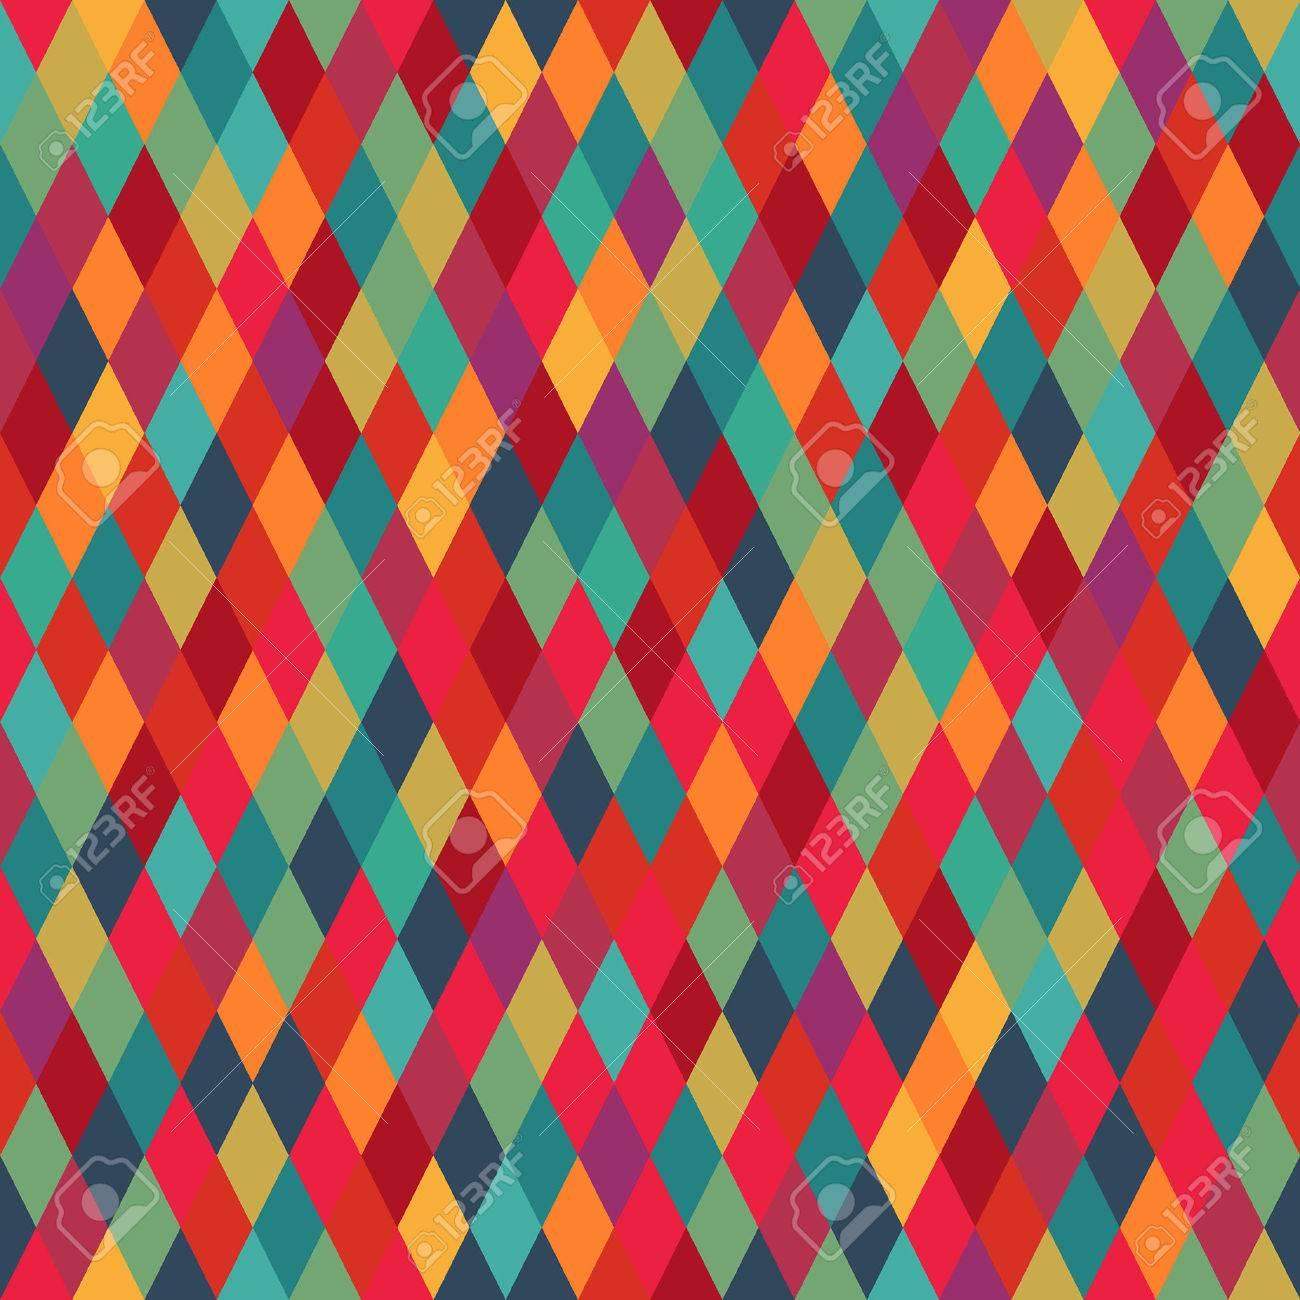 Colorful diamond tiles seamless vector pattern - 24349575